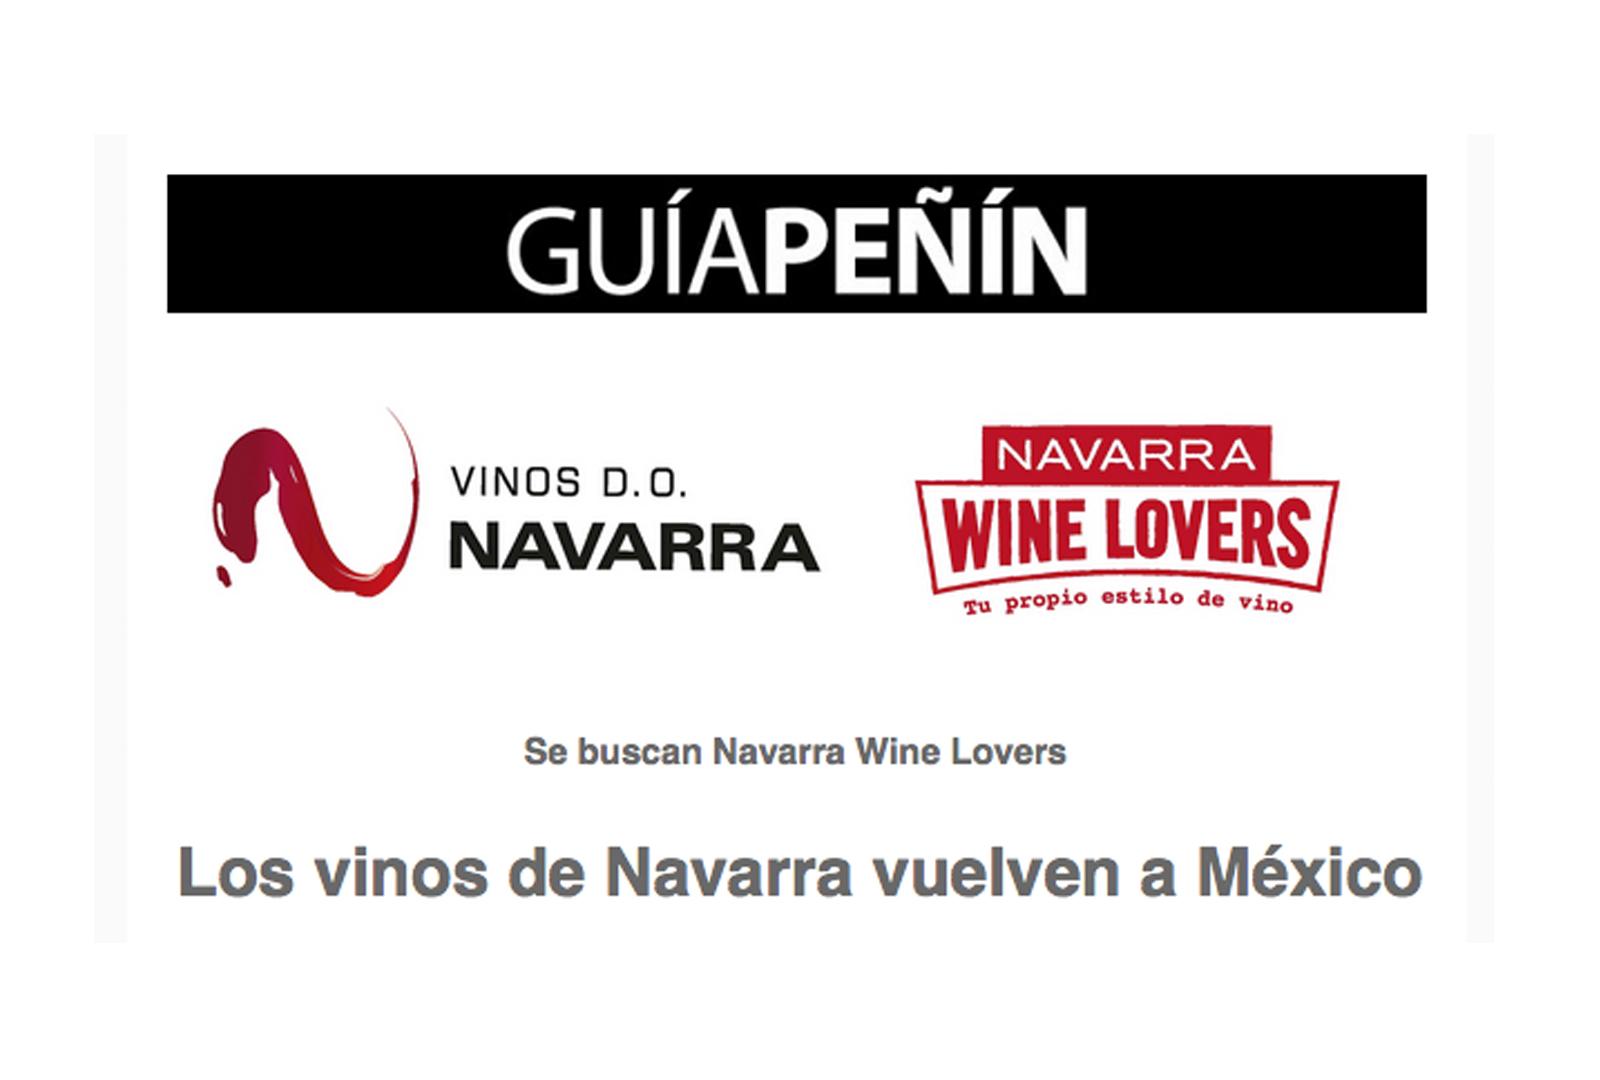 Se buscan Navarra Wine Lovers.